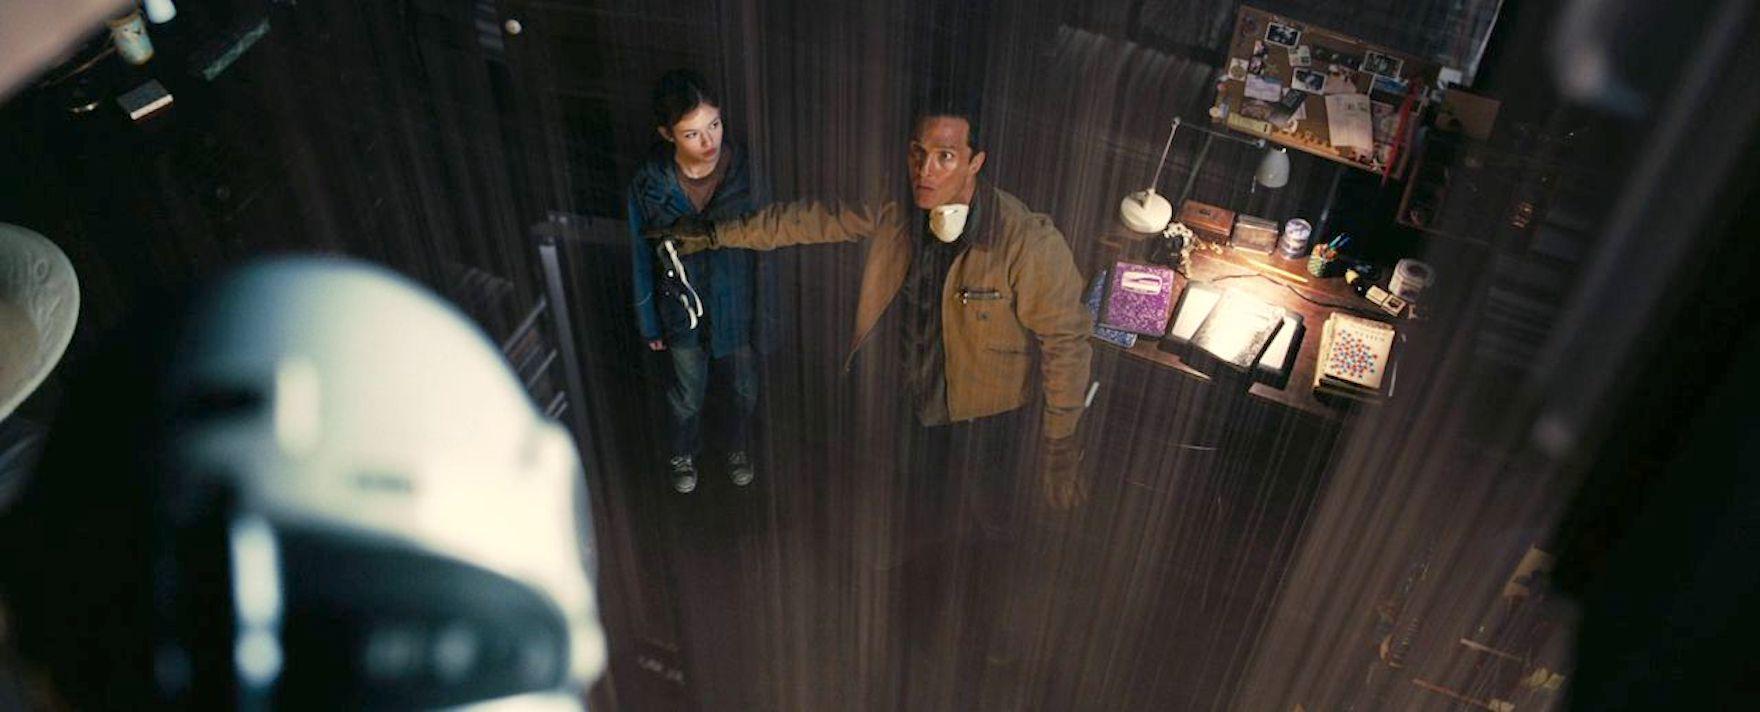 Matthew McConaughey and Mackenzie Foy in Interstellar (2014)